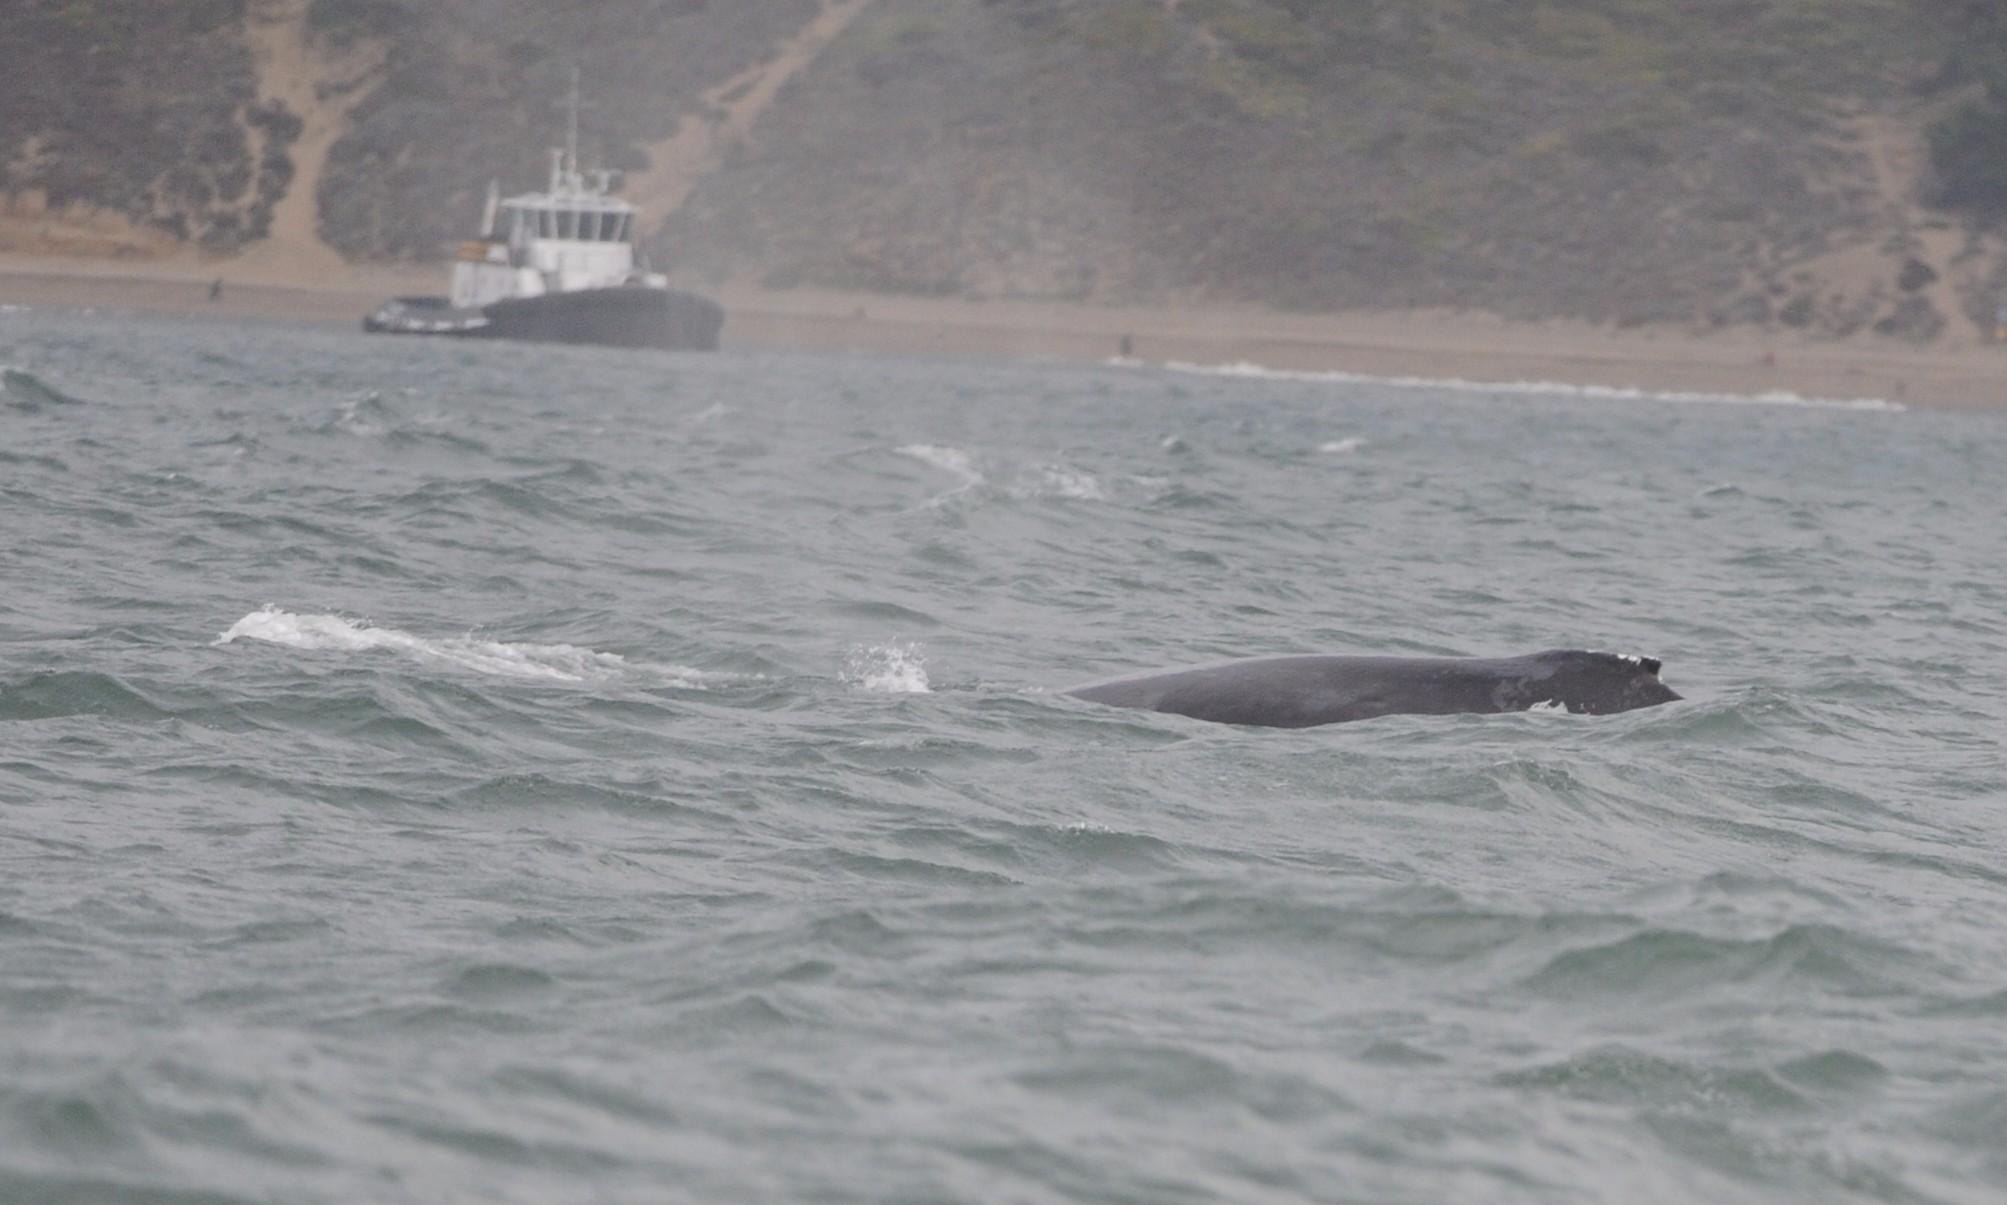 Humpback whale near a tug.